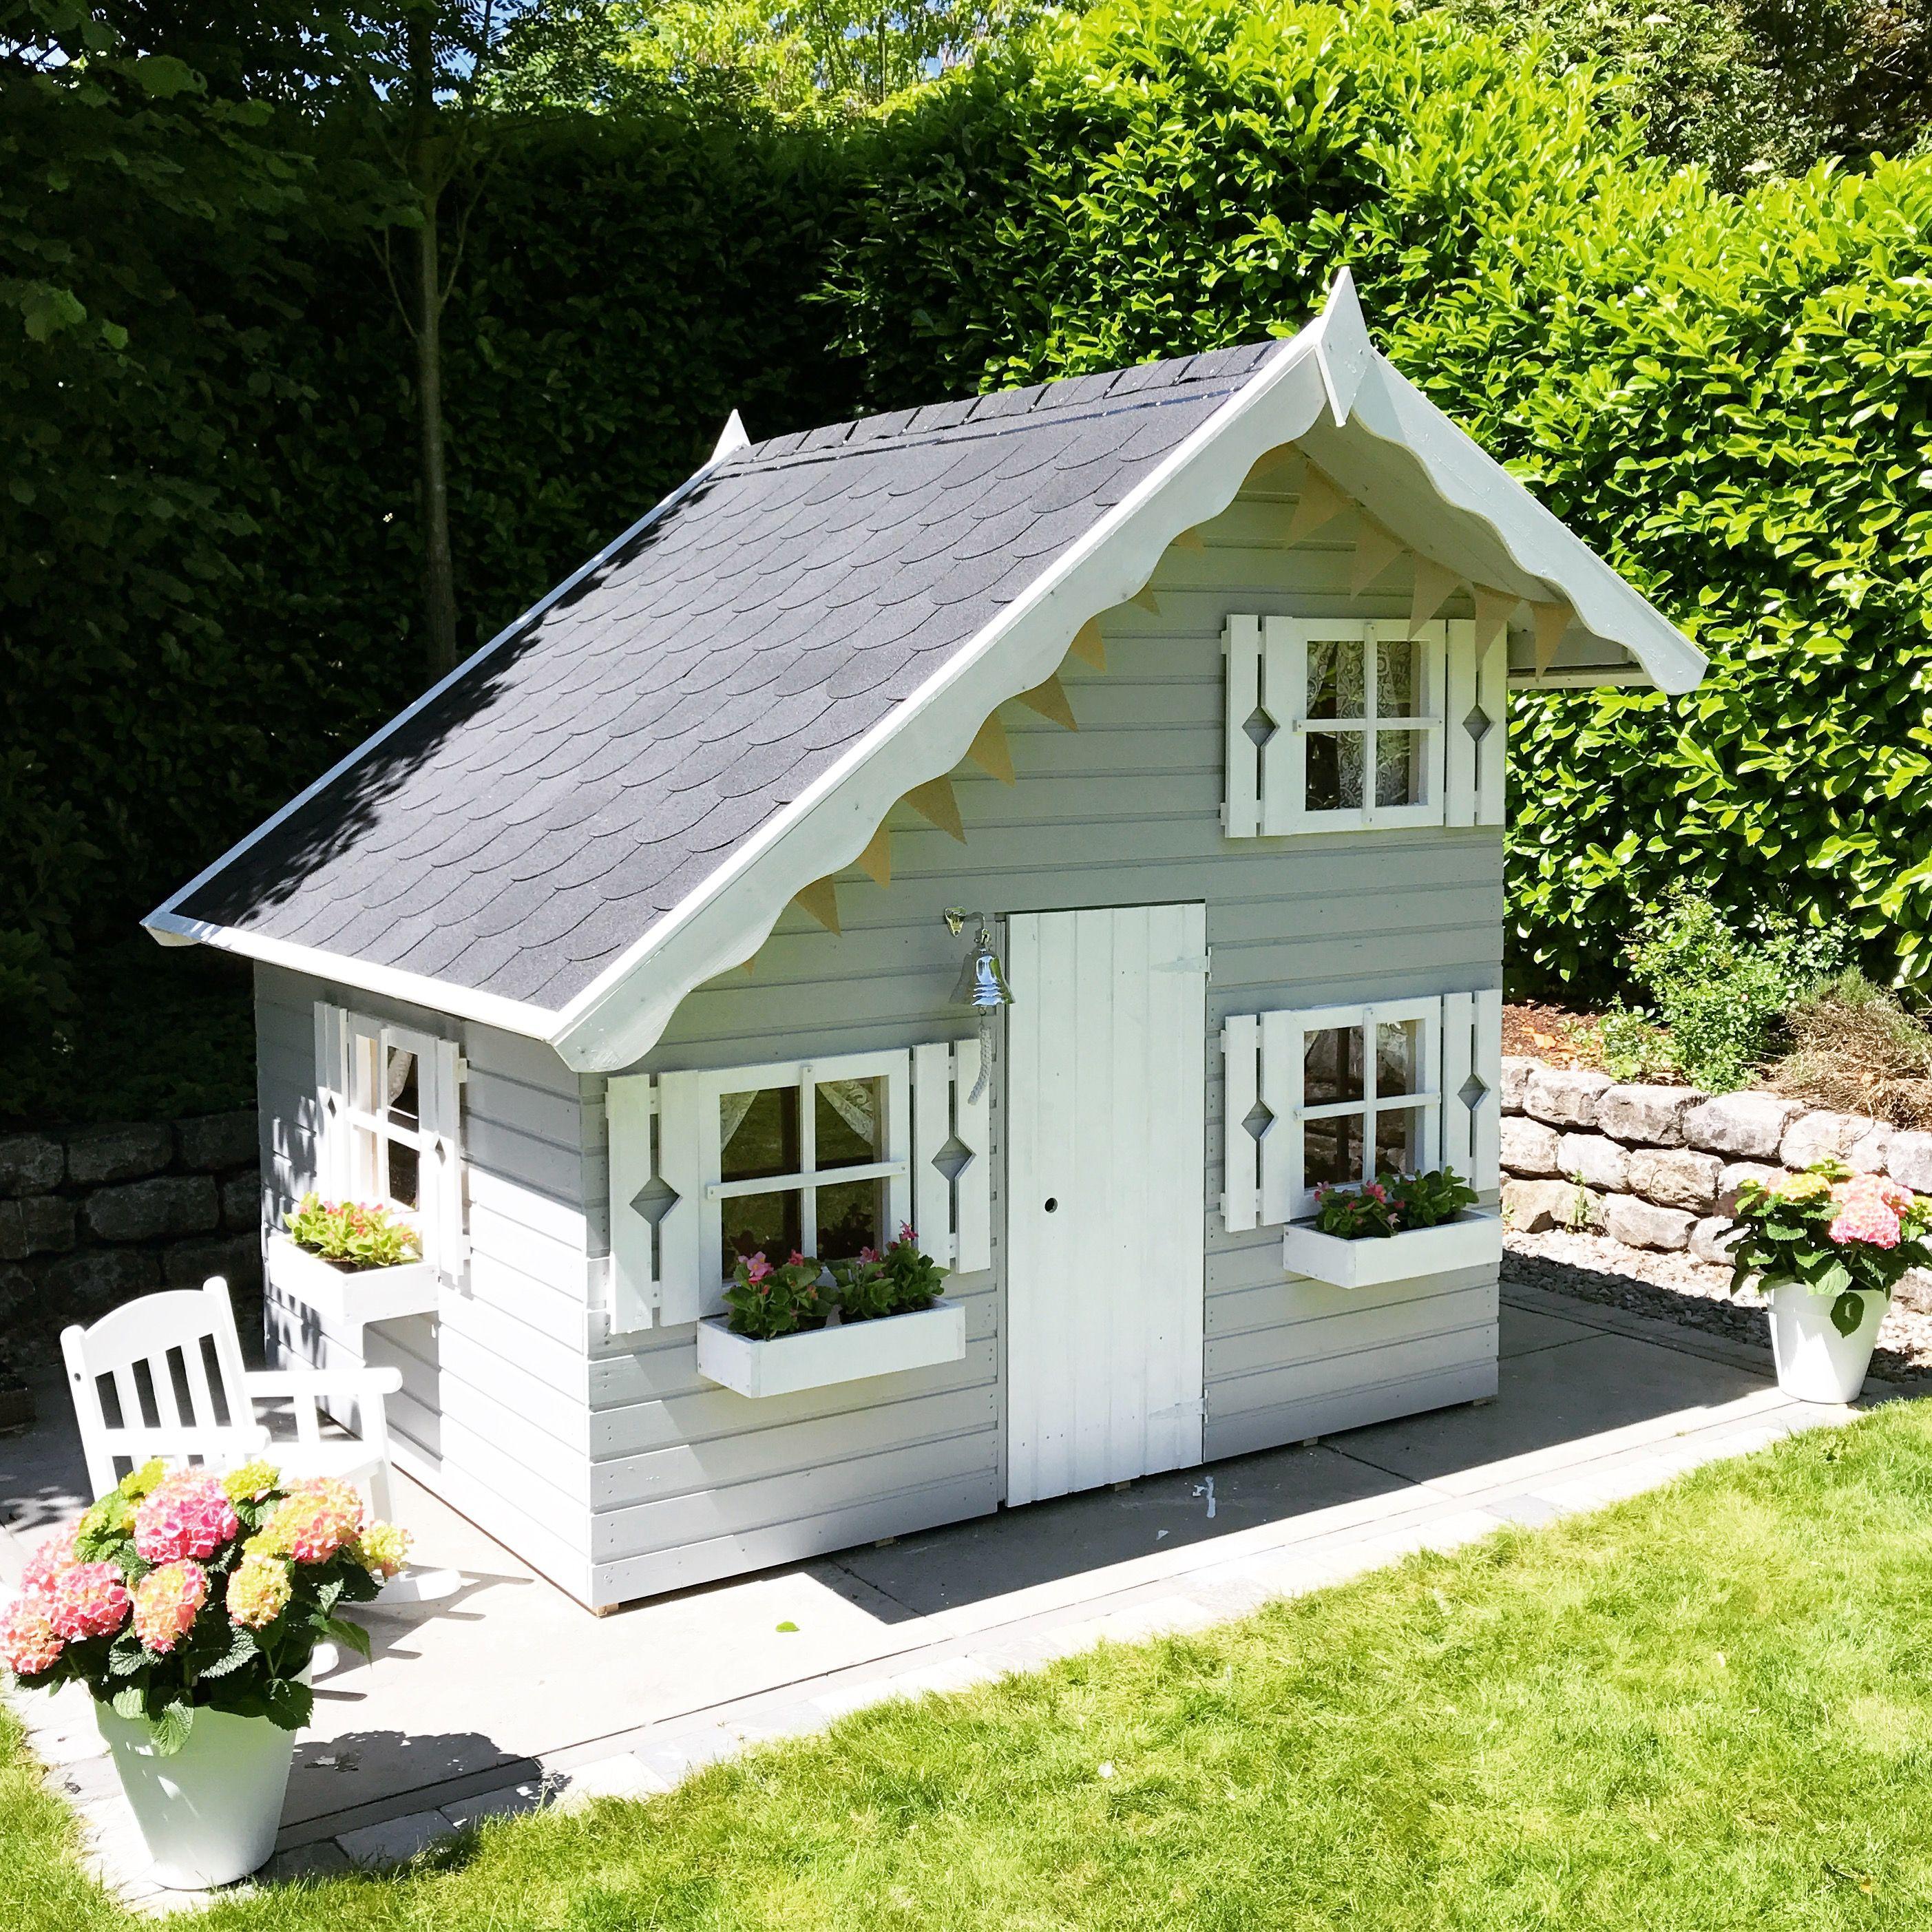 Simple Palmako Tom Spielhaus Kinderhaus